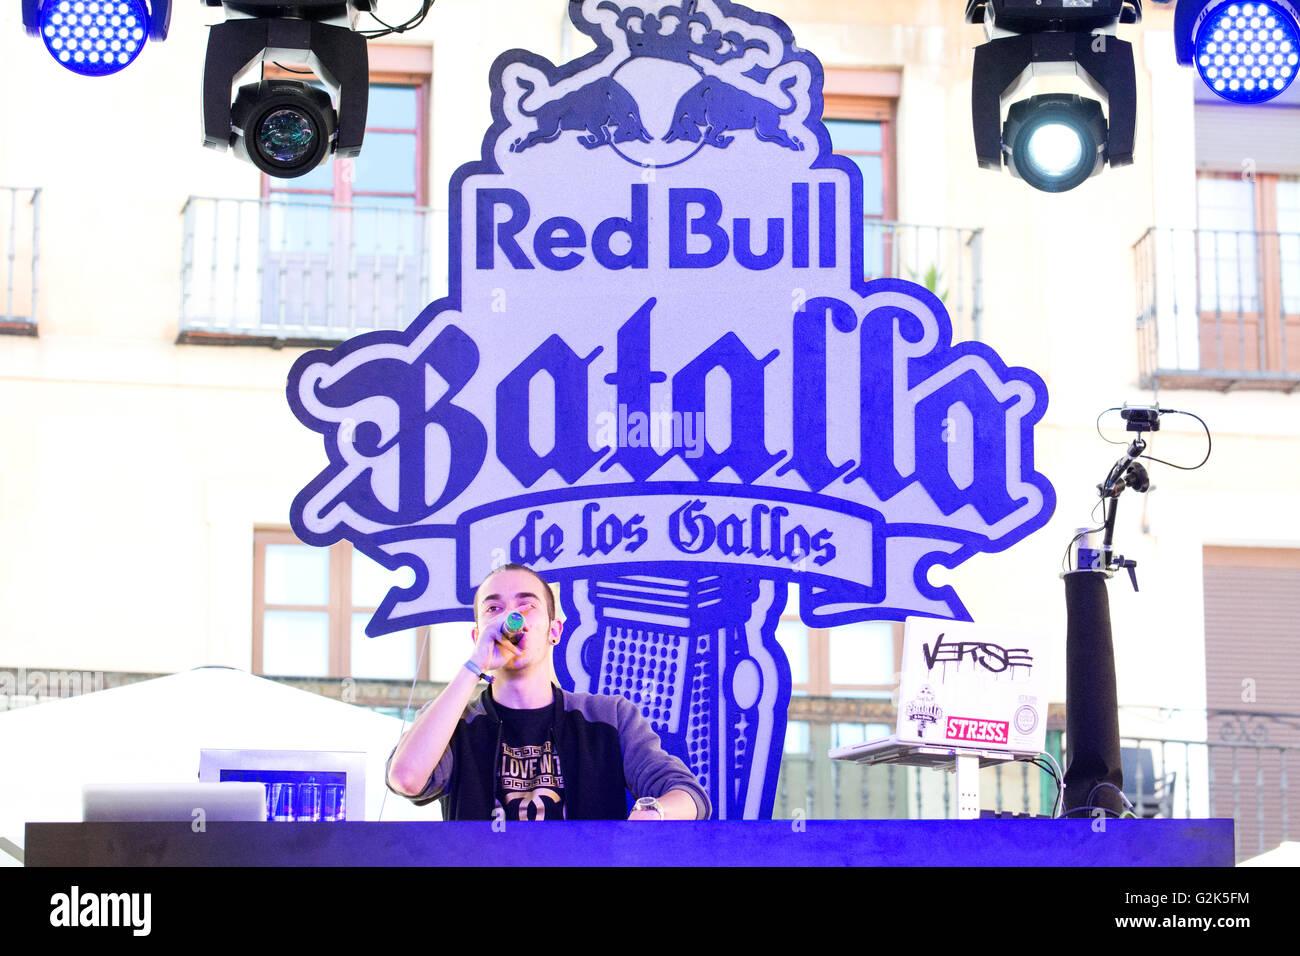 Spanish Rapper 'Arce' sings at freestyle battle 'RedBull Batalla de Los Gallos' in Leon (Spain) - Stock Image